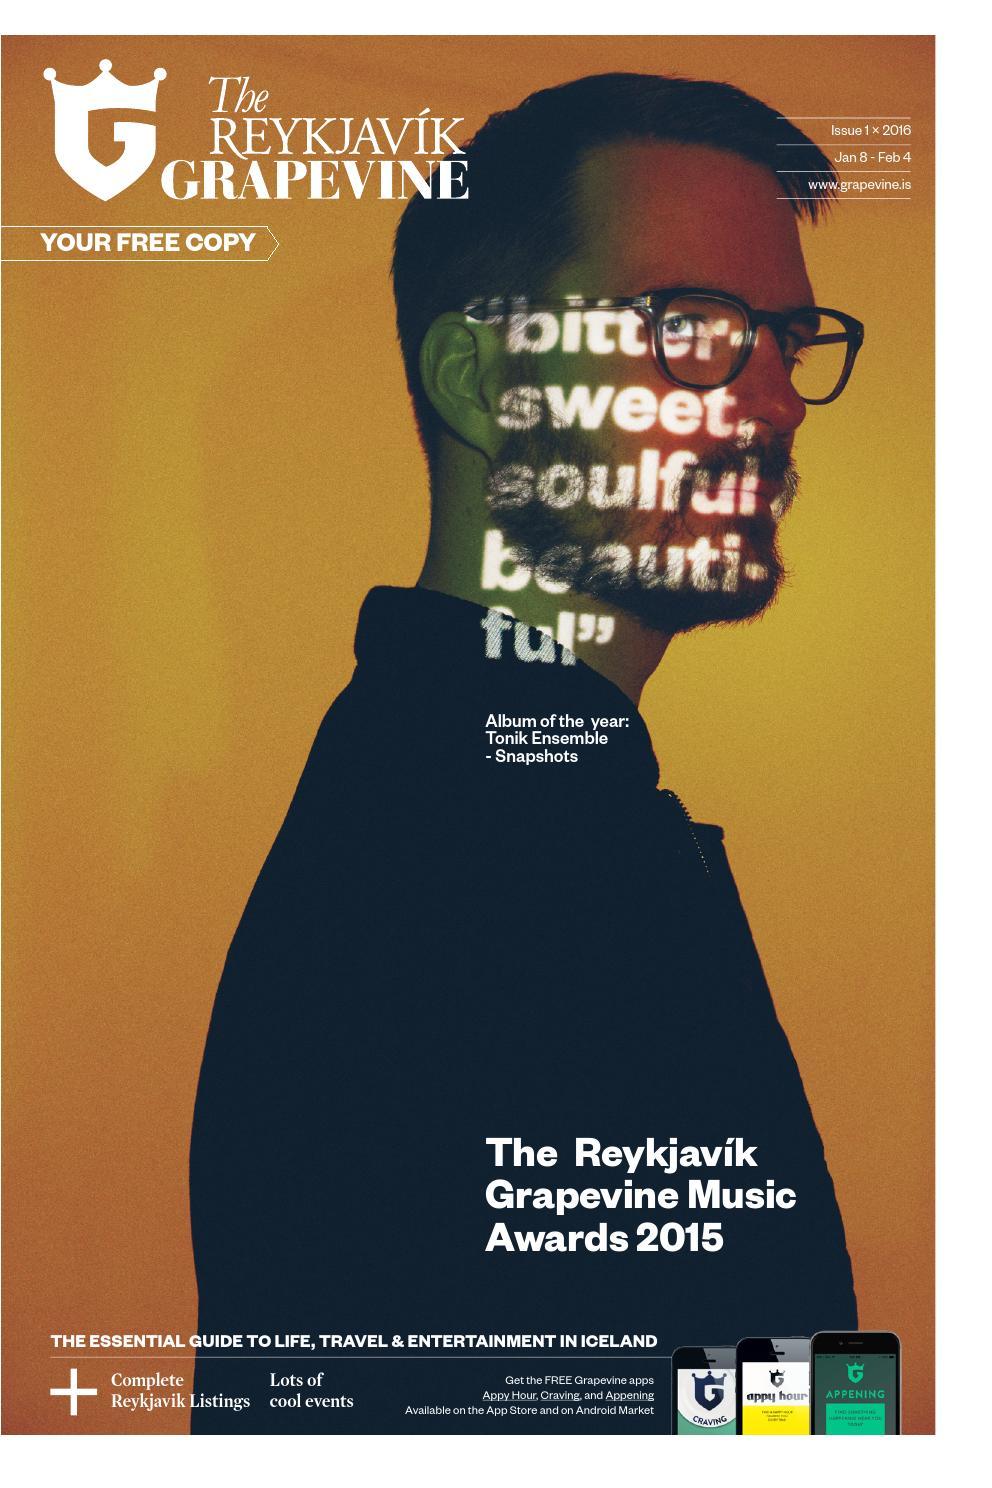 Reykjavik Grapevine, issue 01, 2016 by Reykjavík Grapevine - issuu